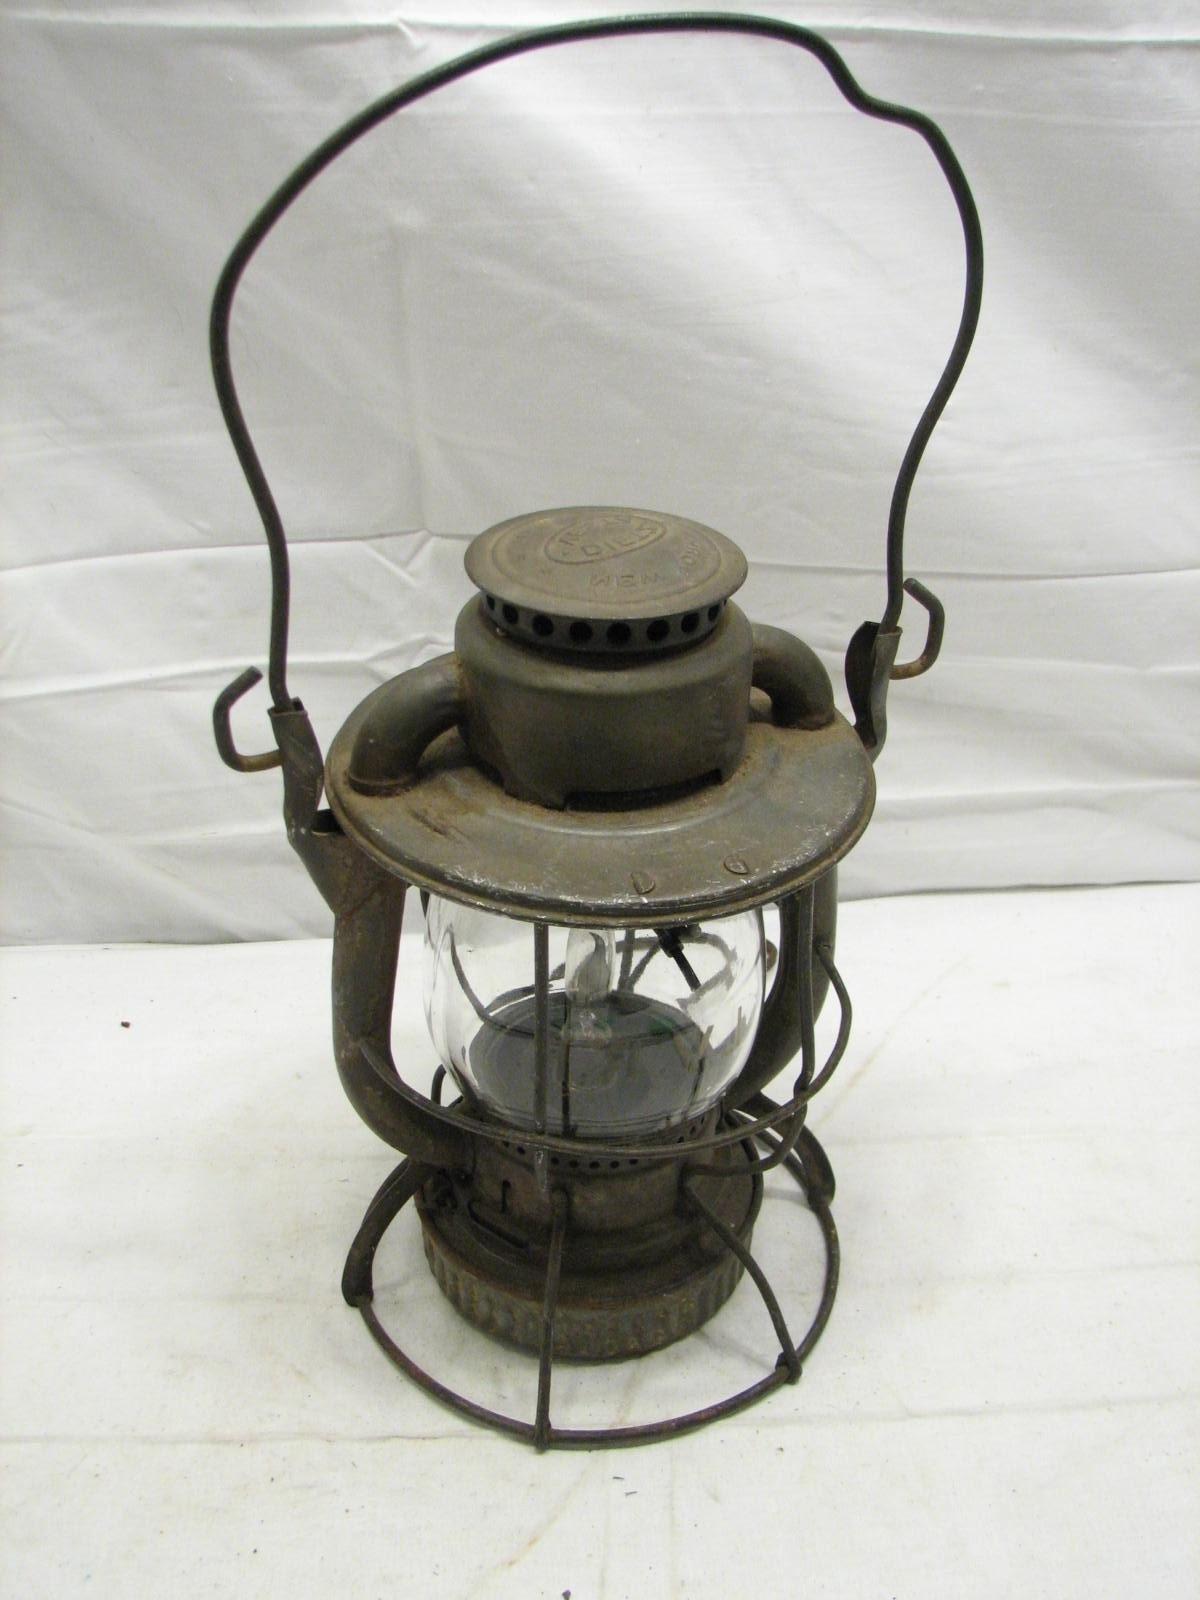 Most Popular Antique Lvrr Lehigh Valley Railroad Lantern Dietz Vesta Electrified Regarding Outdoor Railroad Lanterns (View 14 of 20)